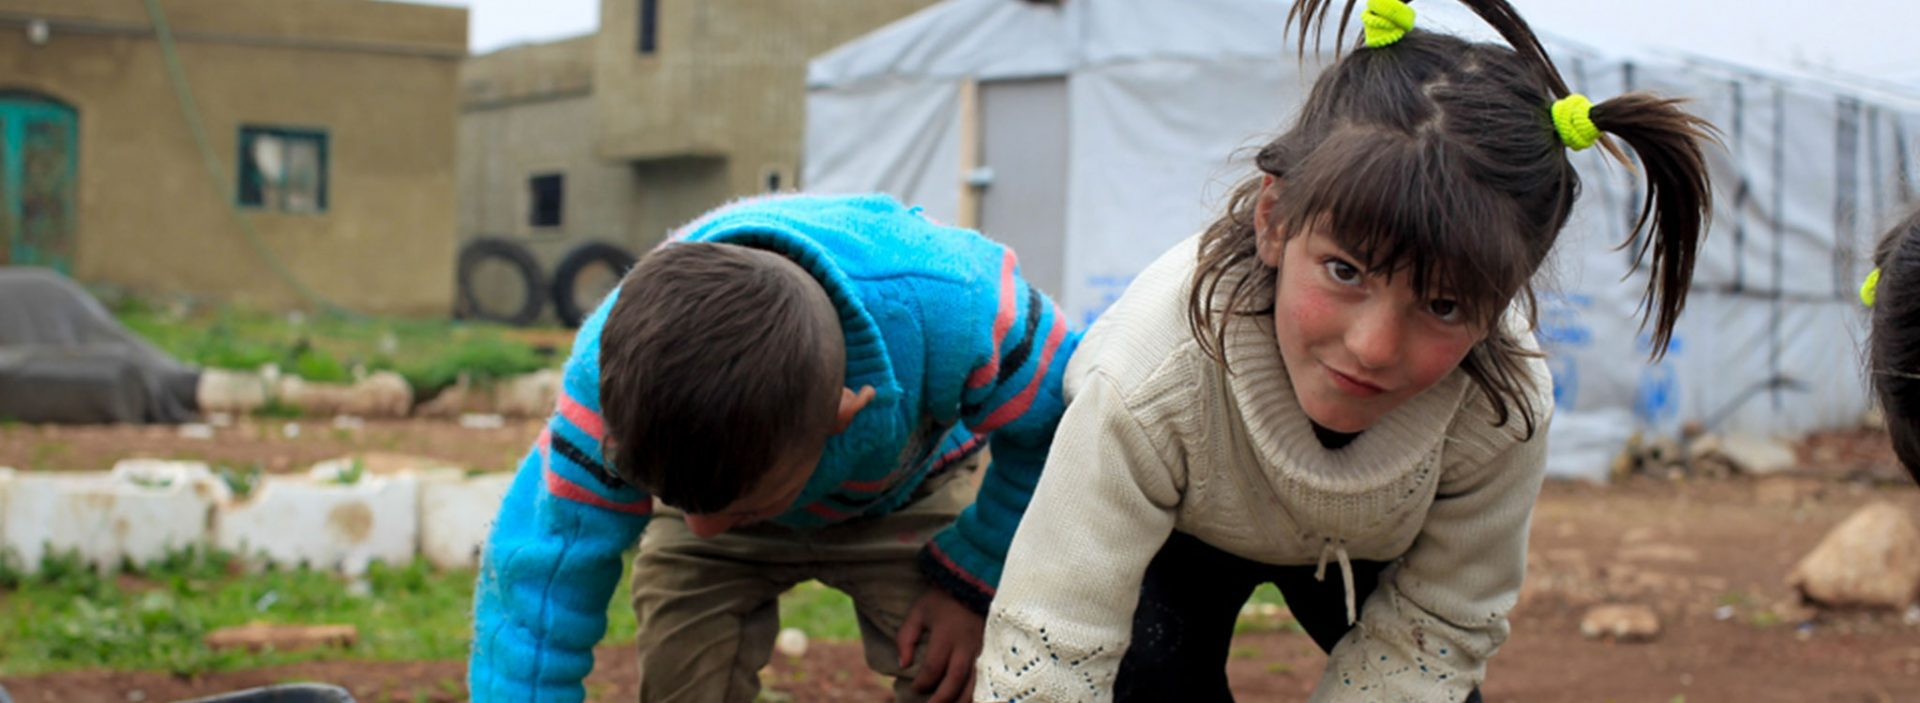 Syrian refugees planting seeds